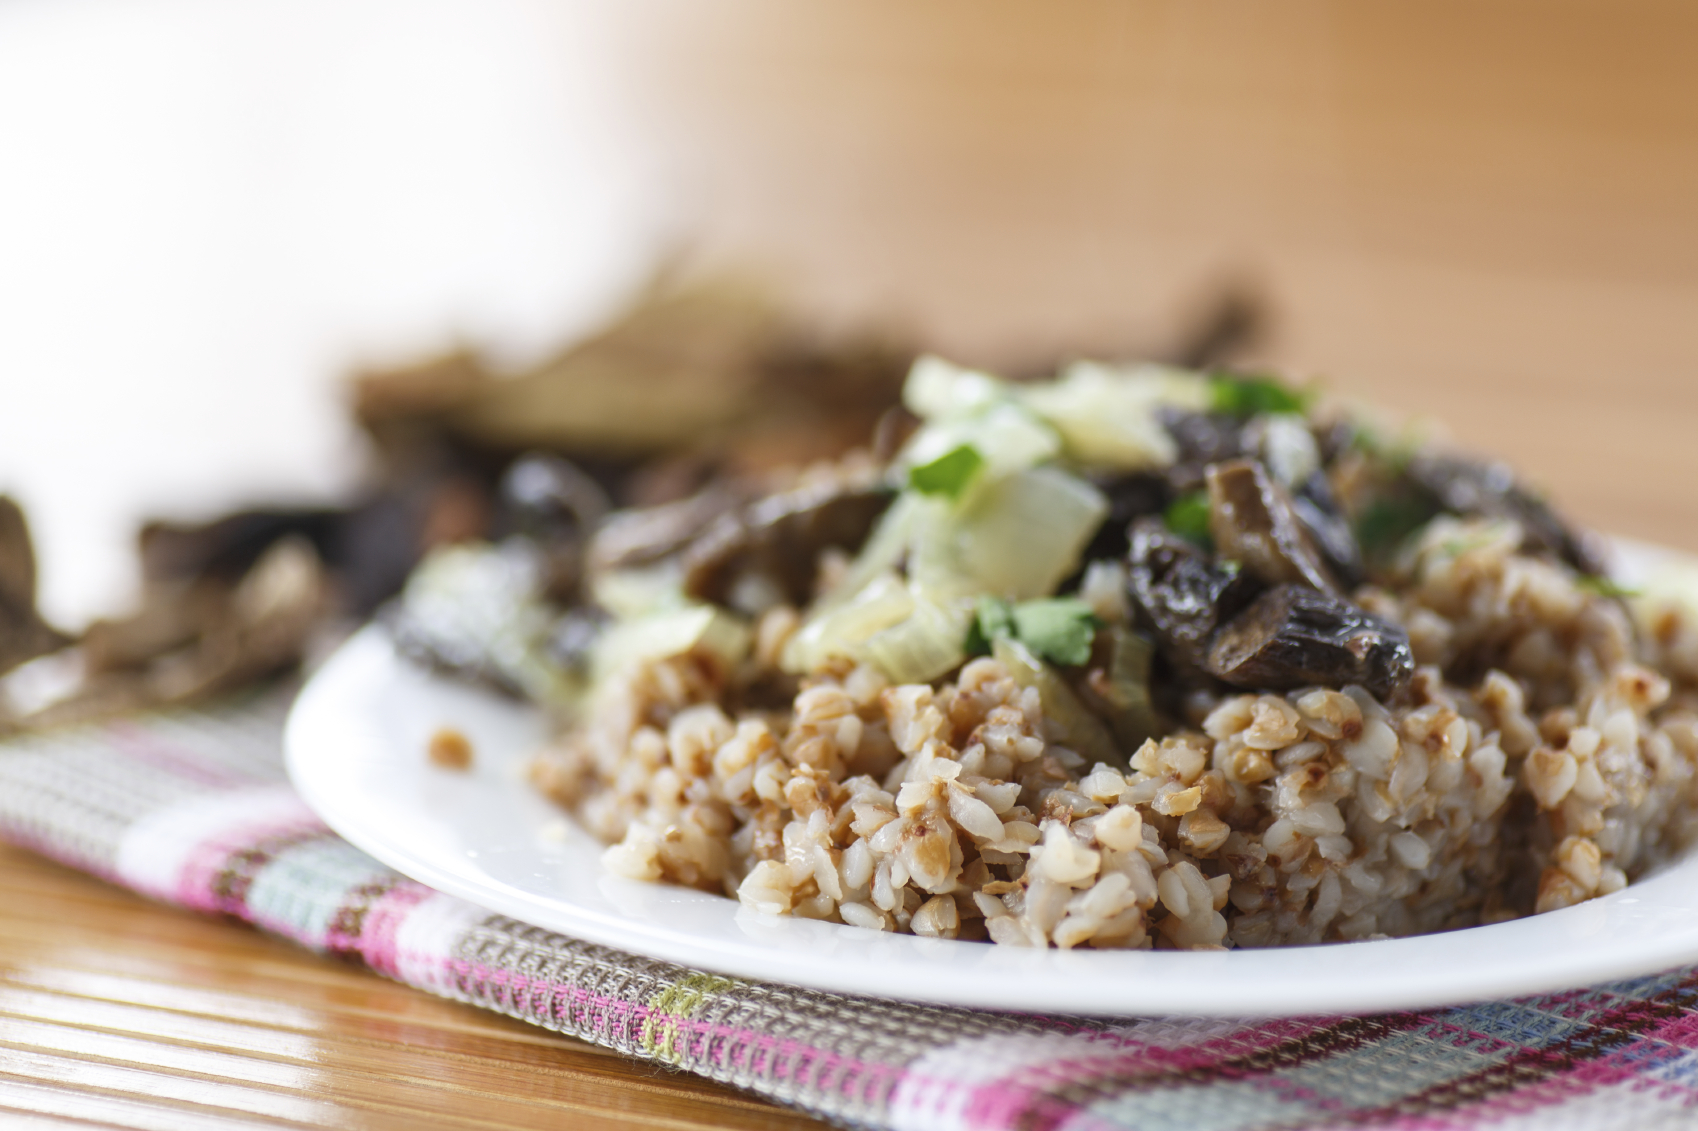 Barley with mushrooms: Xgħir (barley) bil-mushrooms